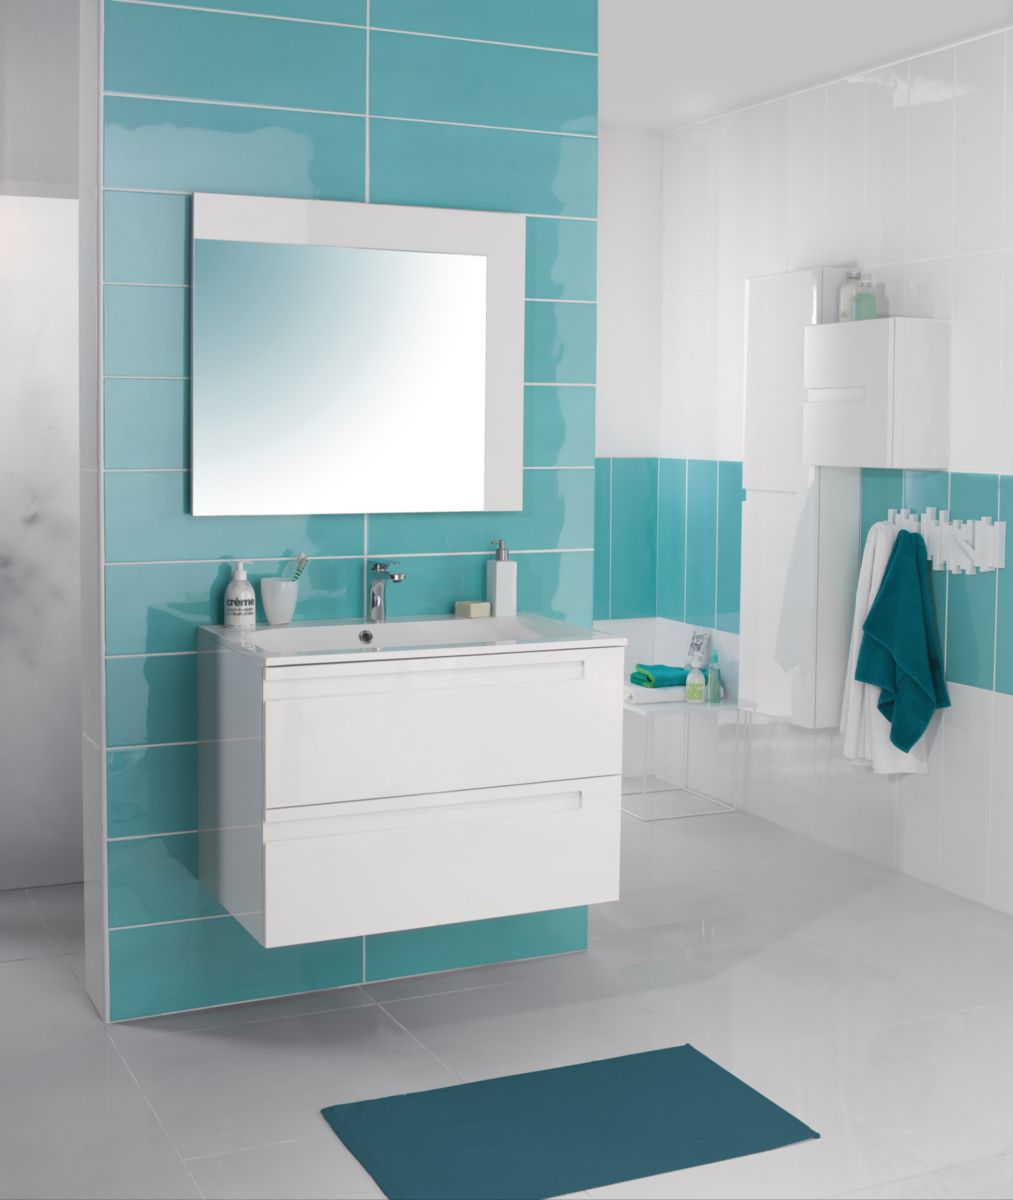 Carrelage bleu turquoise salle de bain fashion designs for Carrelage turquoise